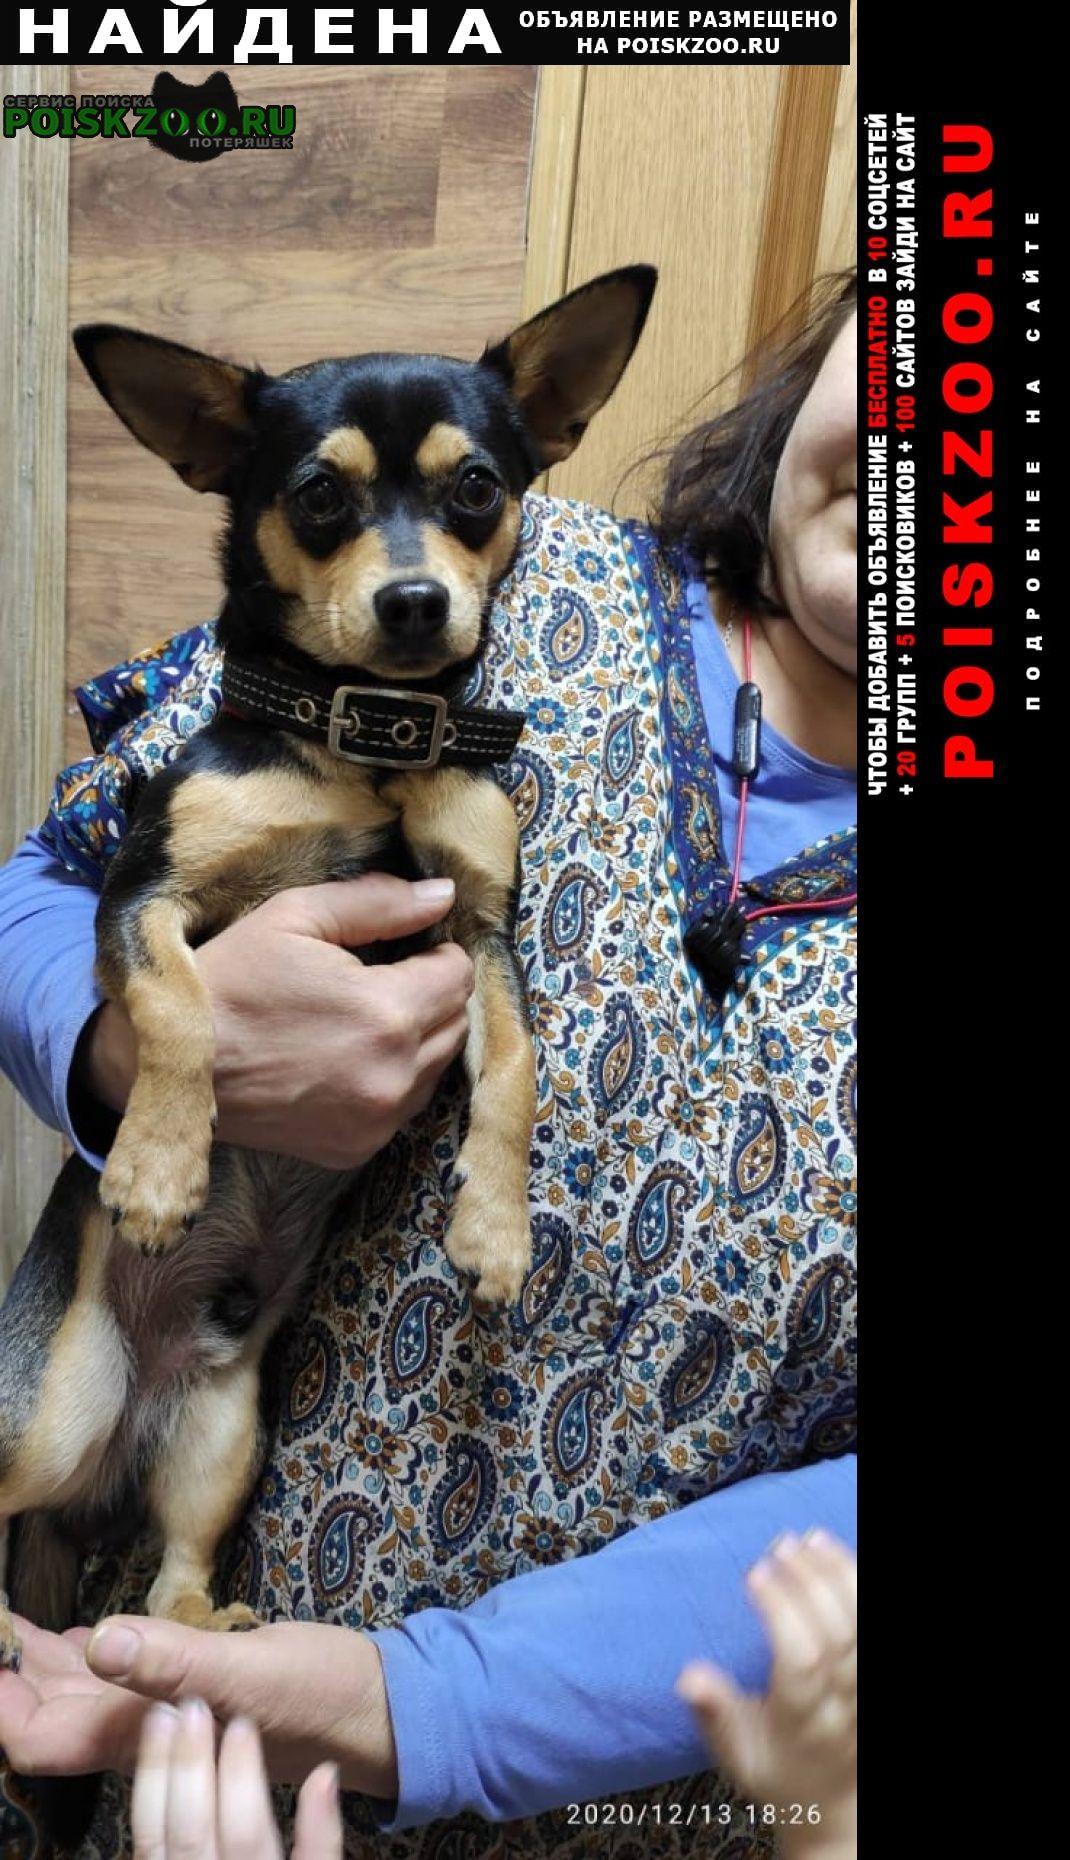 Найдена собака той терьер Волгоград